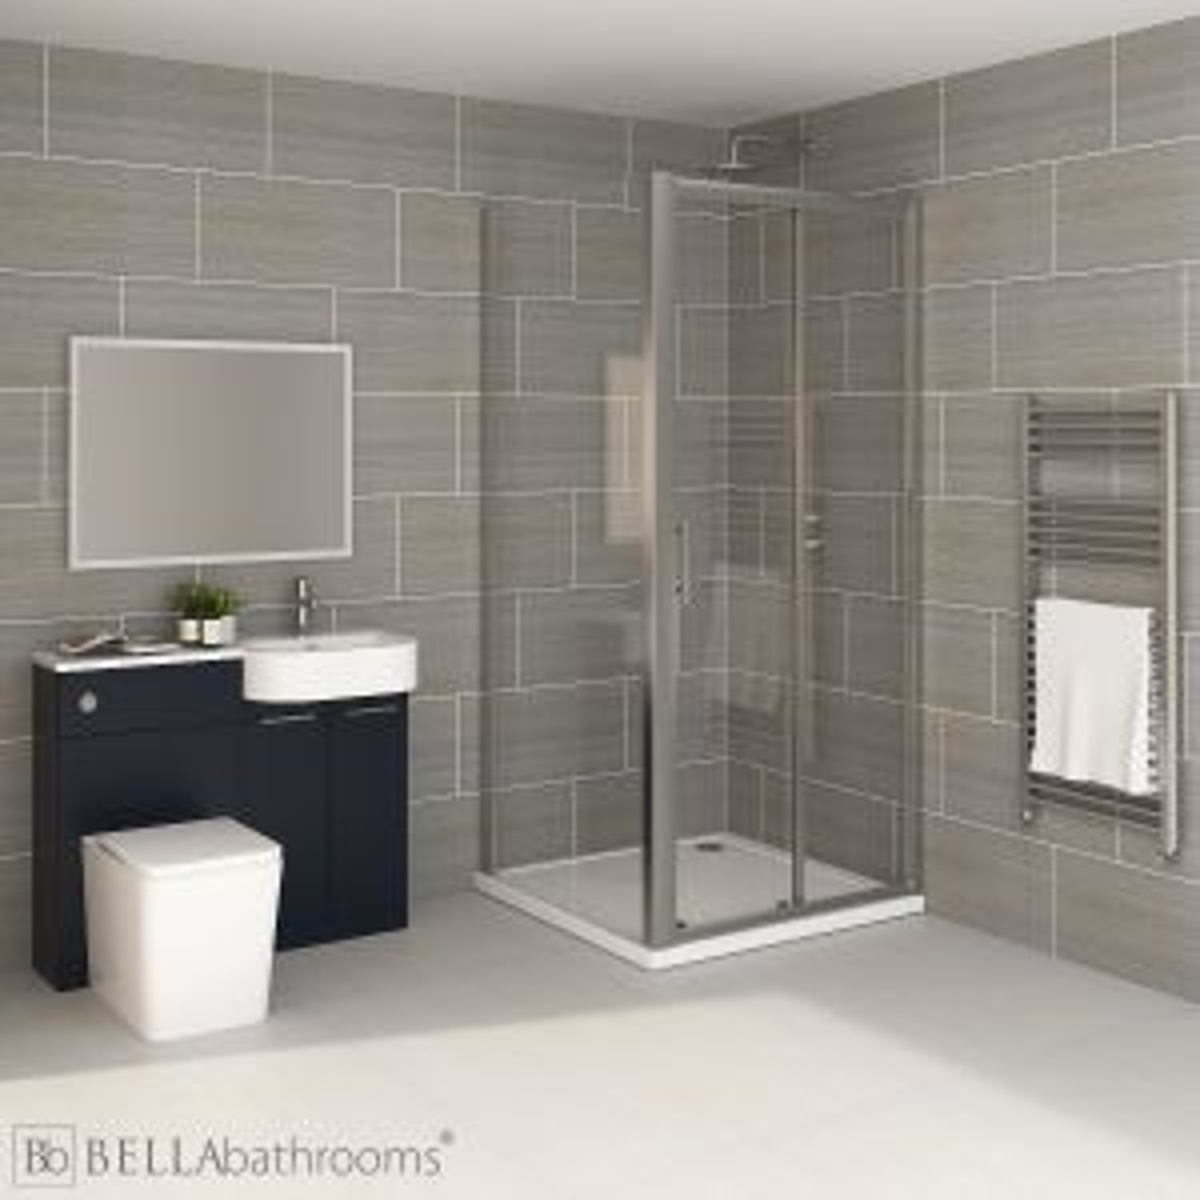 Elation Combination P Shape Indigo Matt Furniture Suite with April Destini Sliding Shower Enclosure with Brearton Toilet